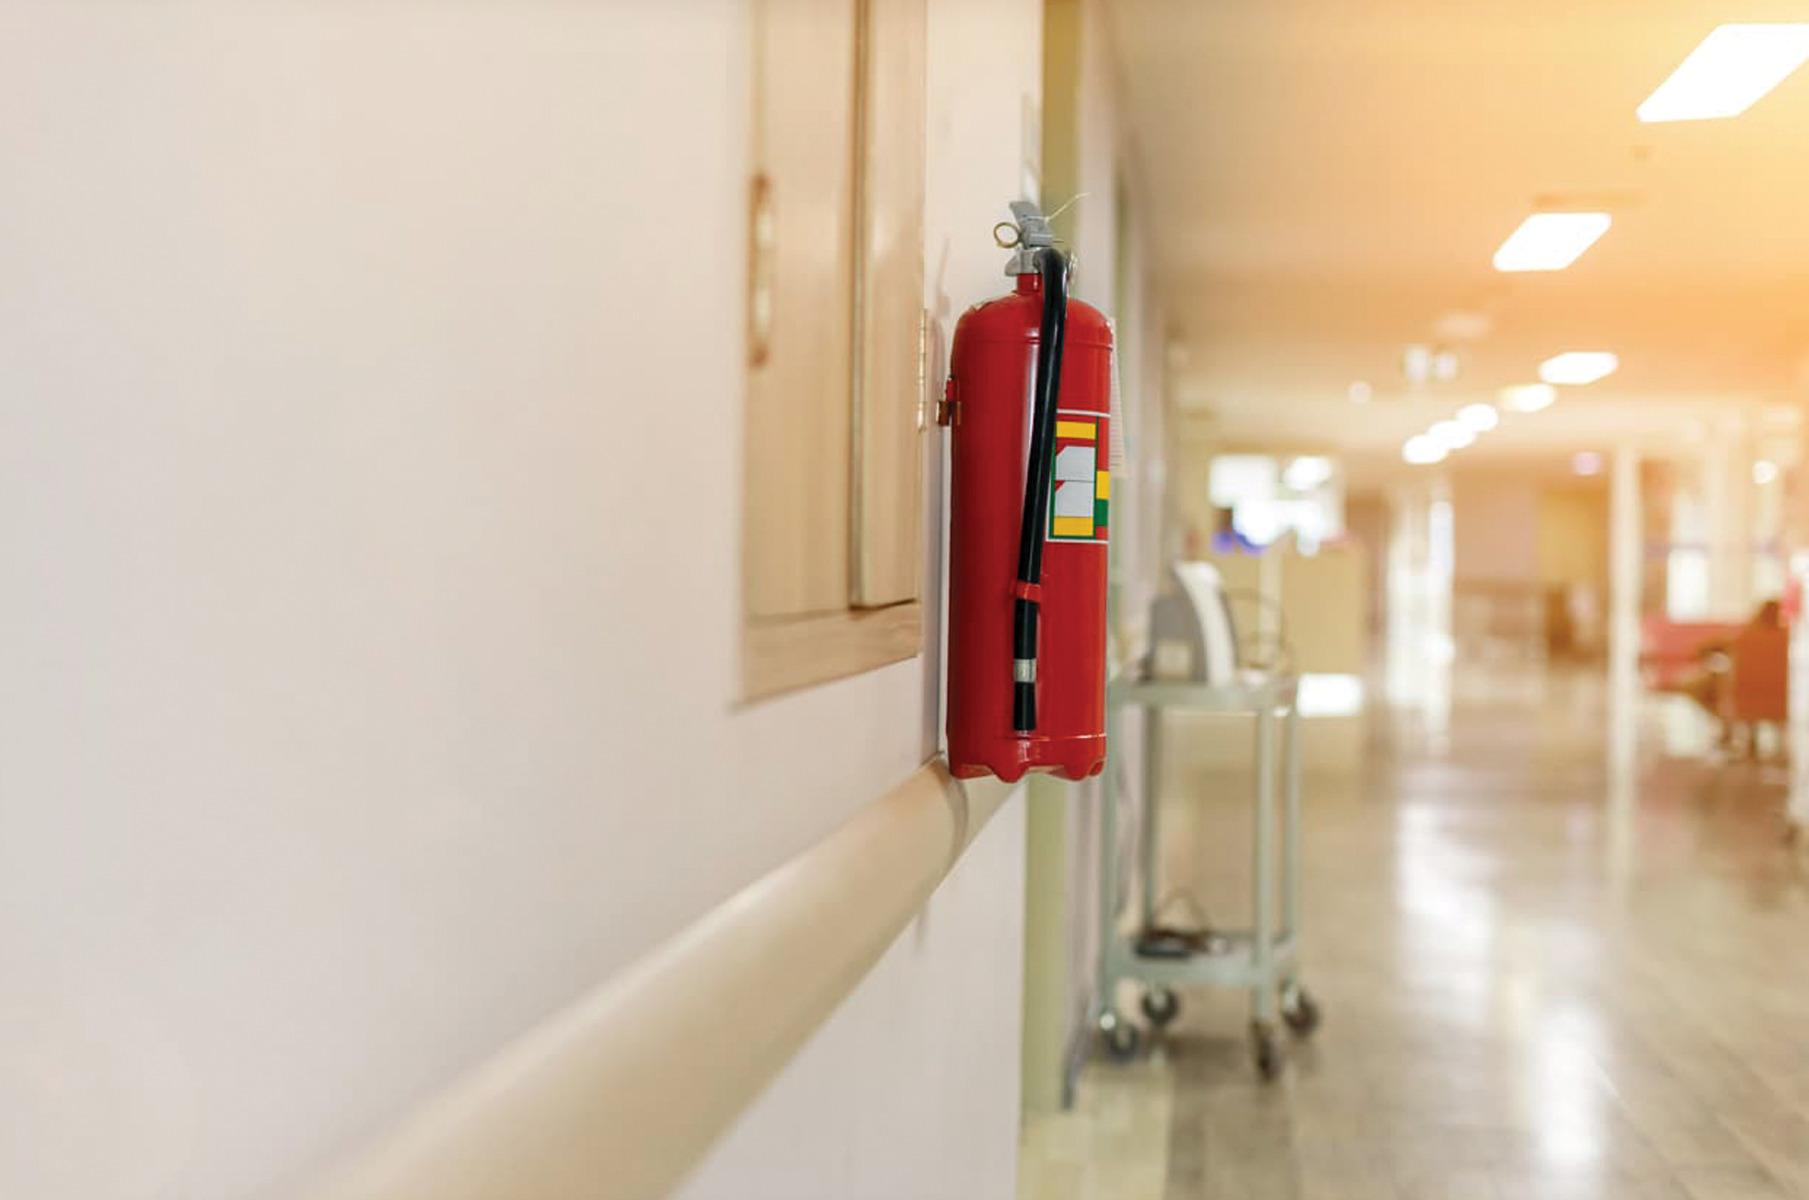 Fire Extinguisher Price in Bangladesh